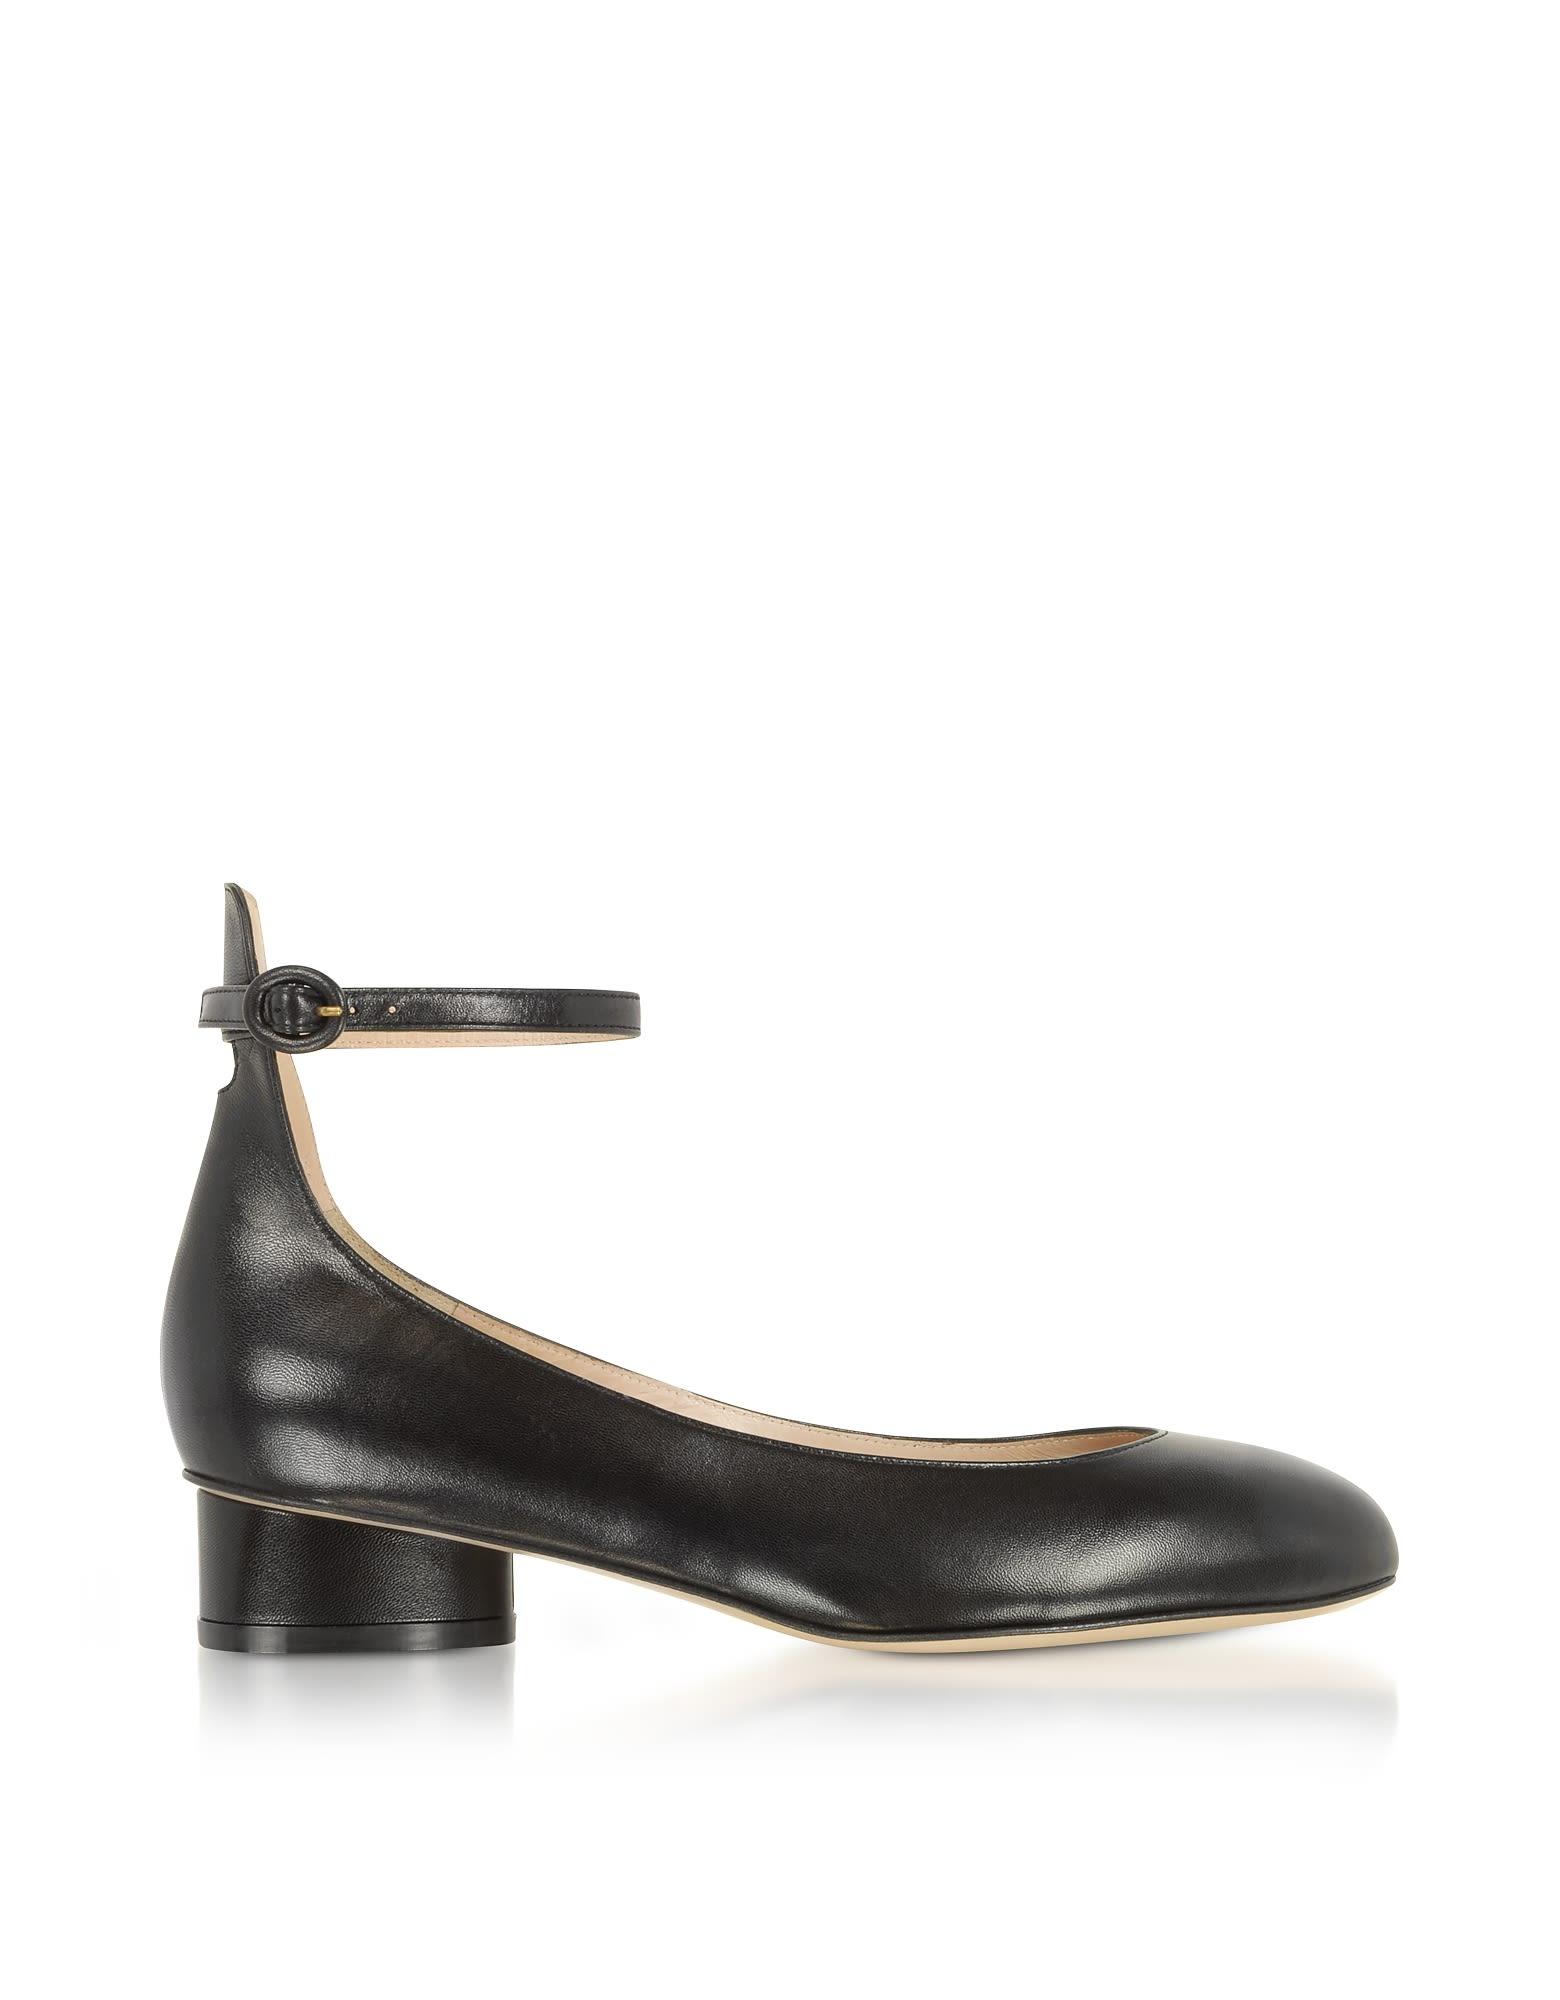 ab848146823a Stuart Weitzman Polly Black Leather Mid-Heel Pump